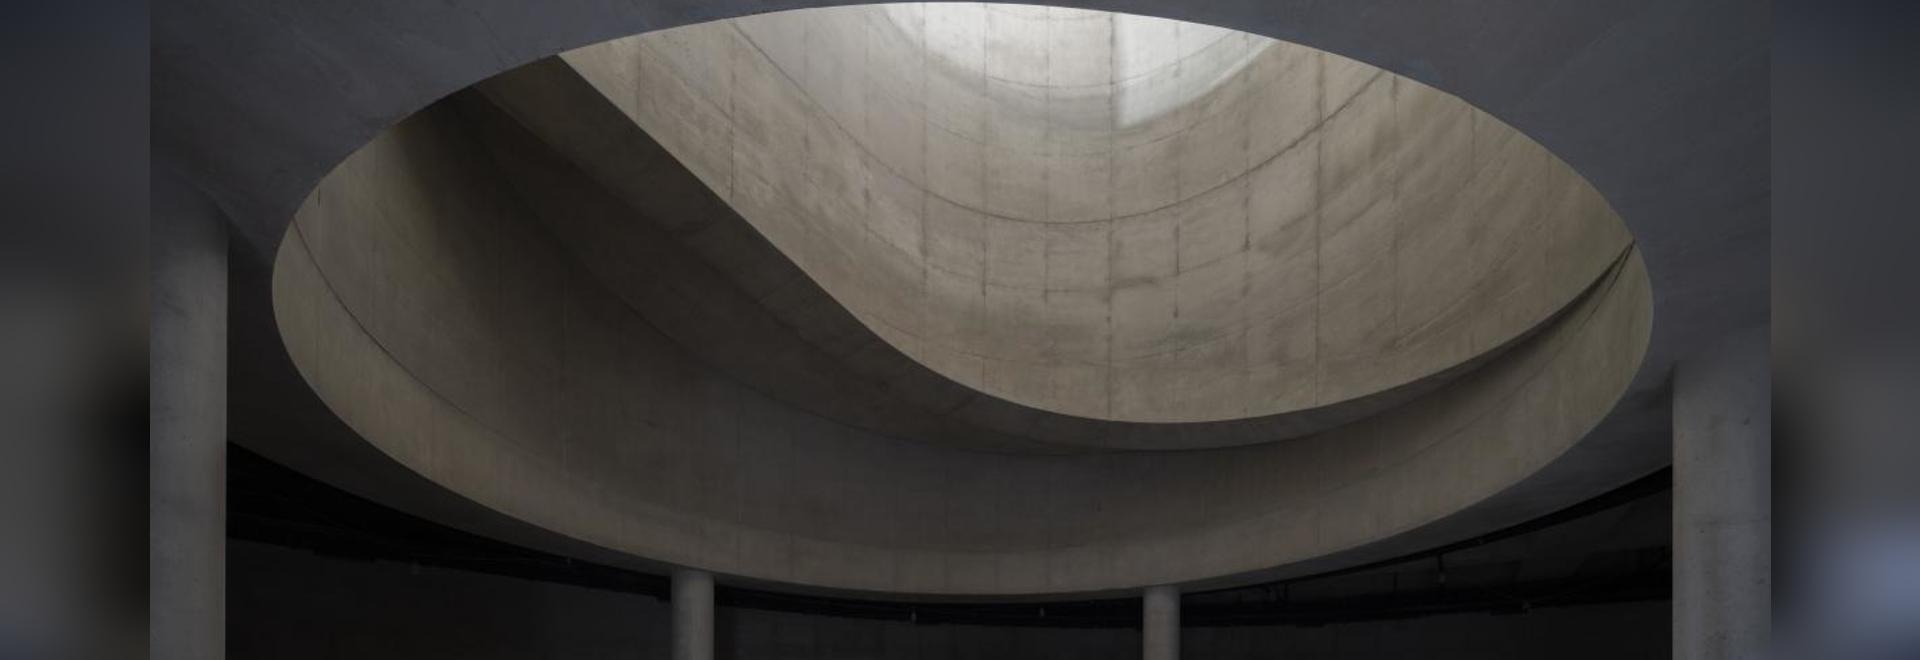 SongEun Art & Cultural Foundation marks Herzog & de Meuron's South Korean debut